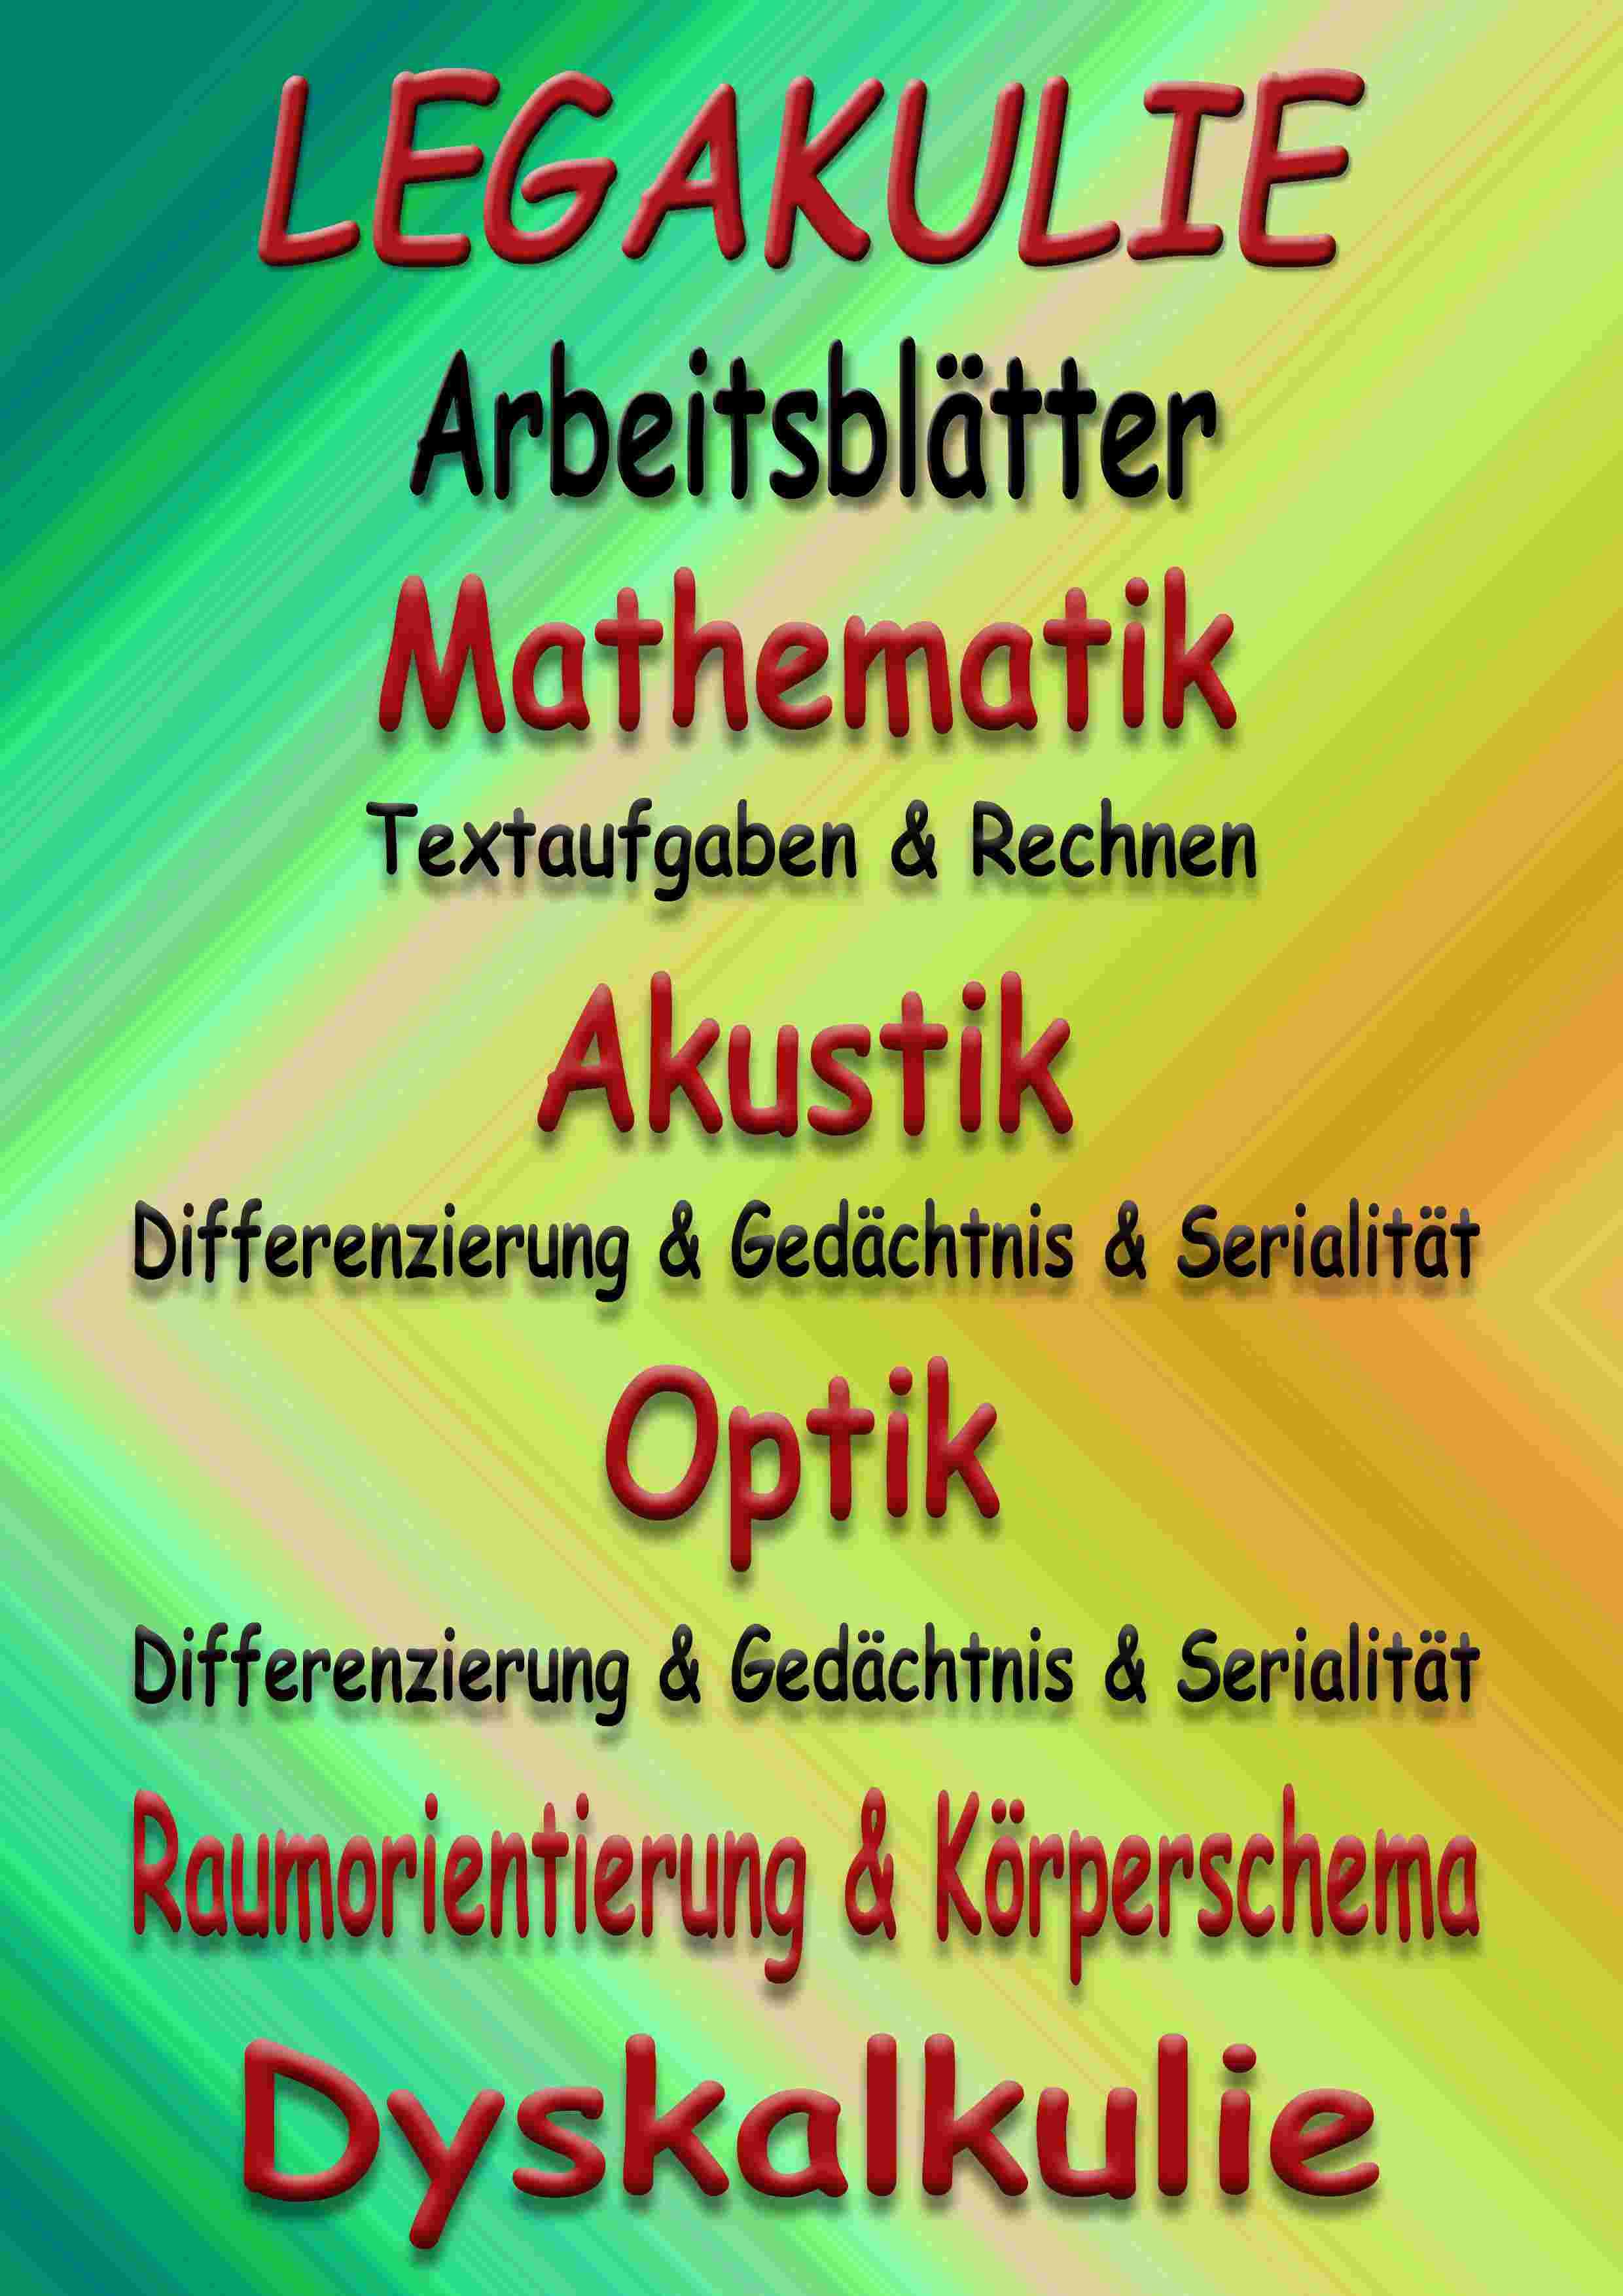 Groß Koordinatenebene Kunst Arbeitsblatt Bilder - Super Lehrer ...